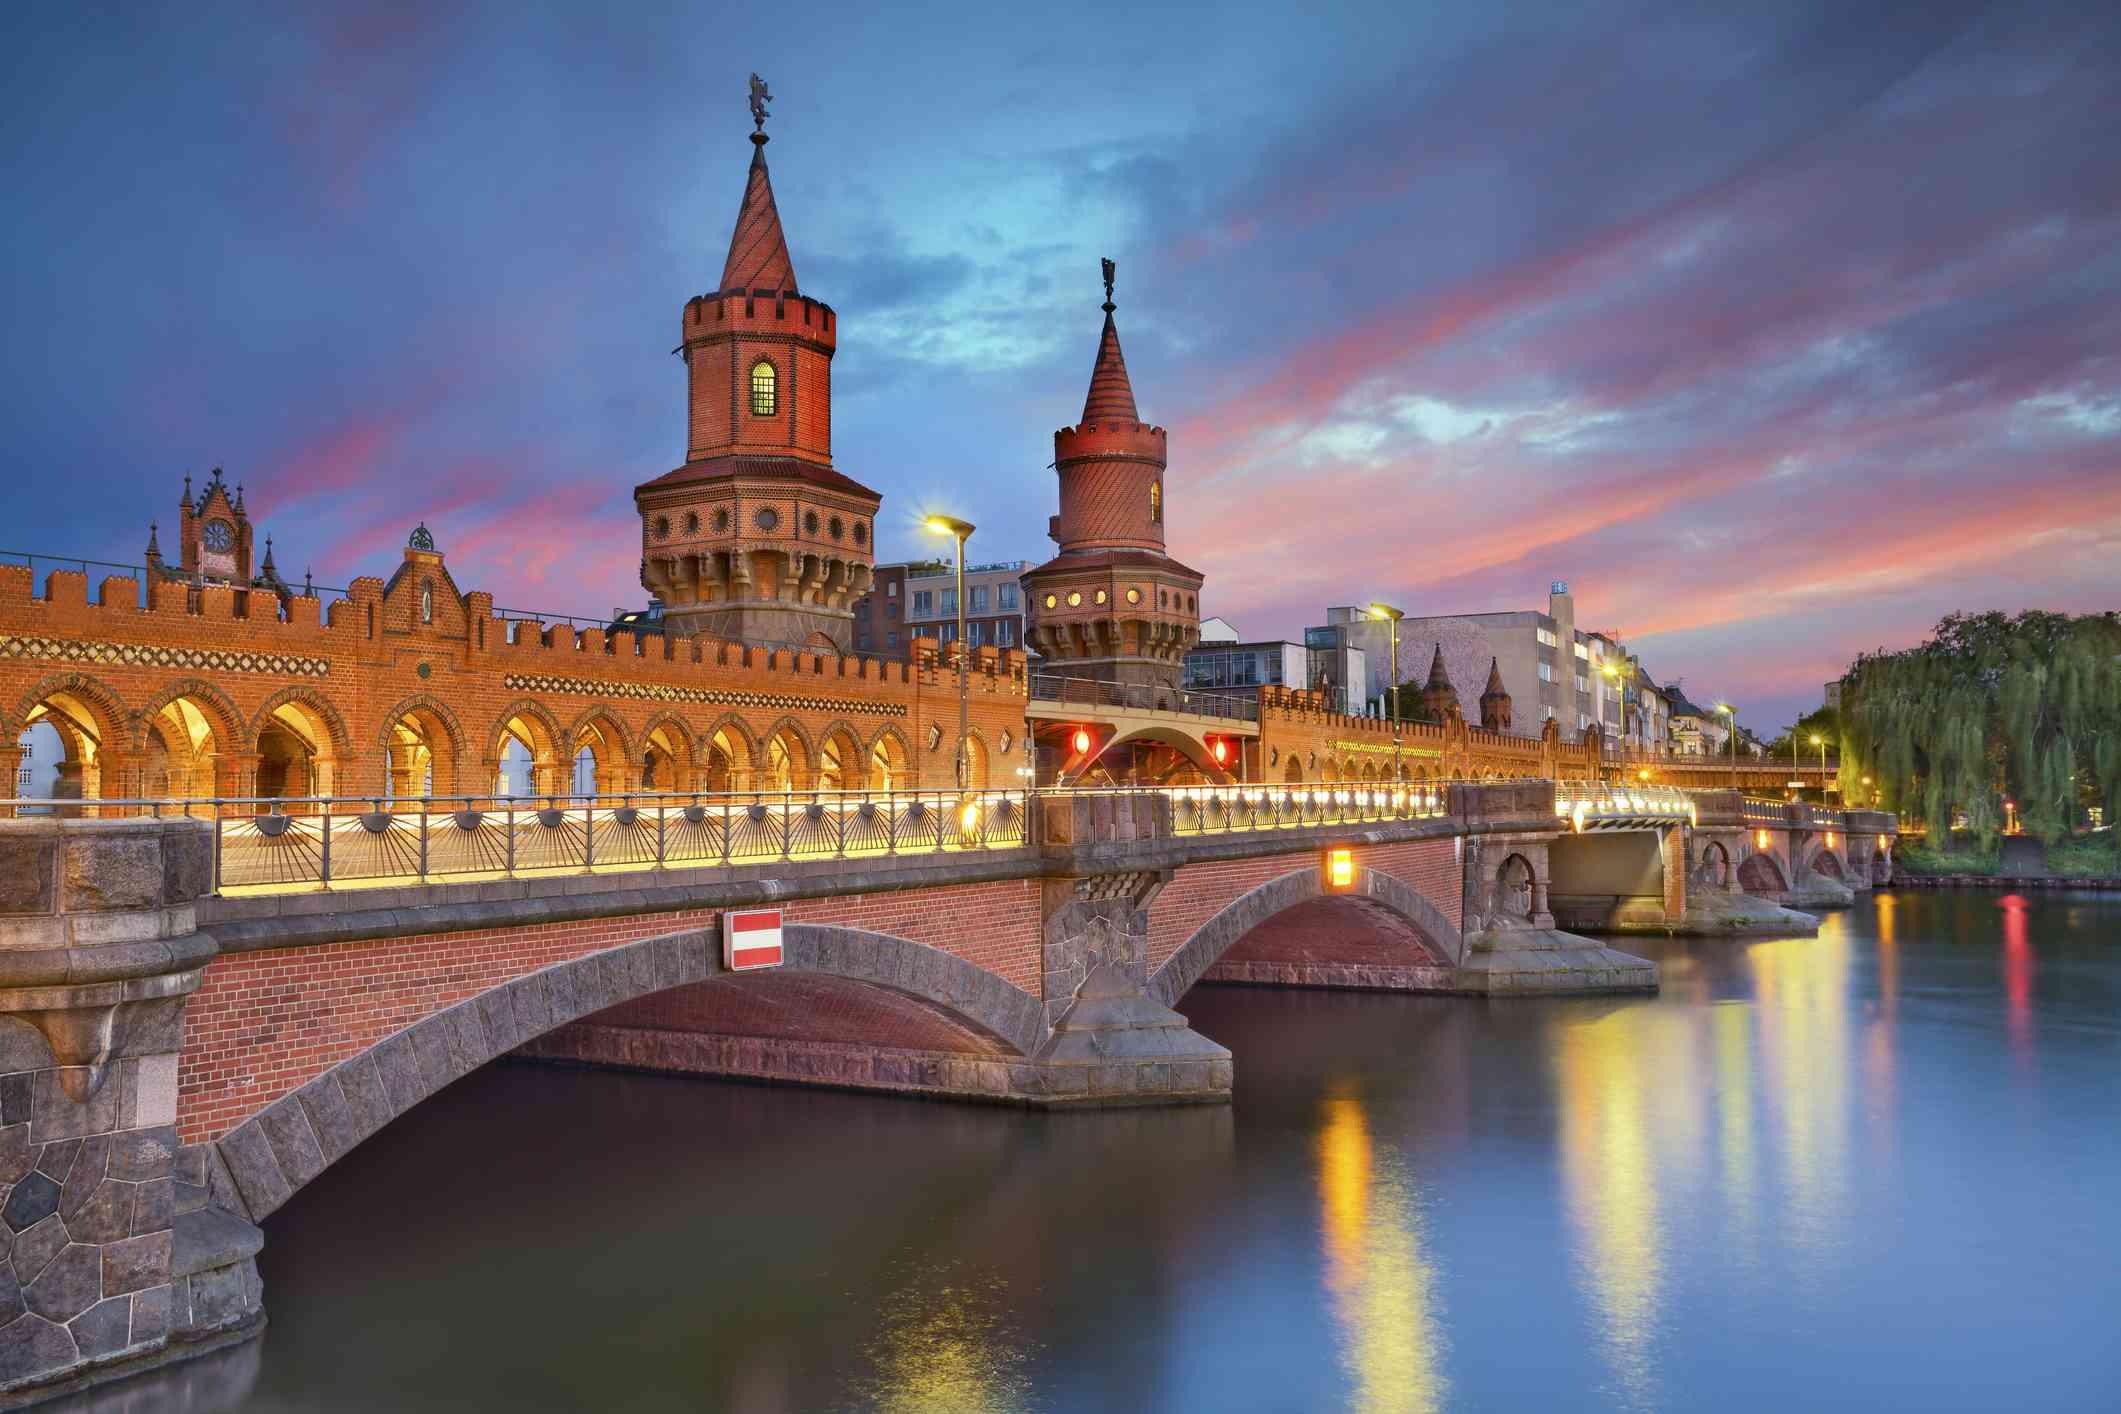 Image of Oberbaum Bridge in Berlin, during dramatic sunset.